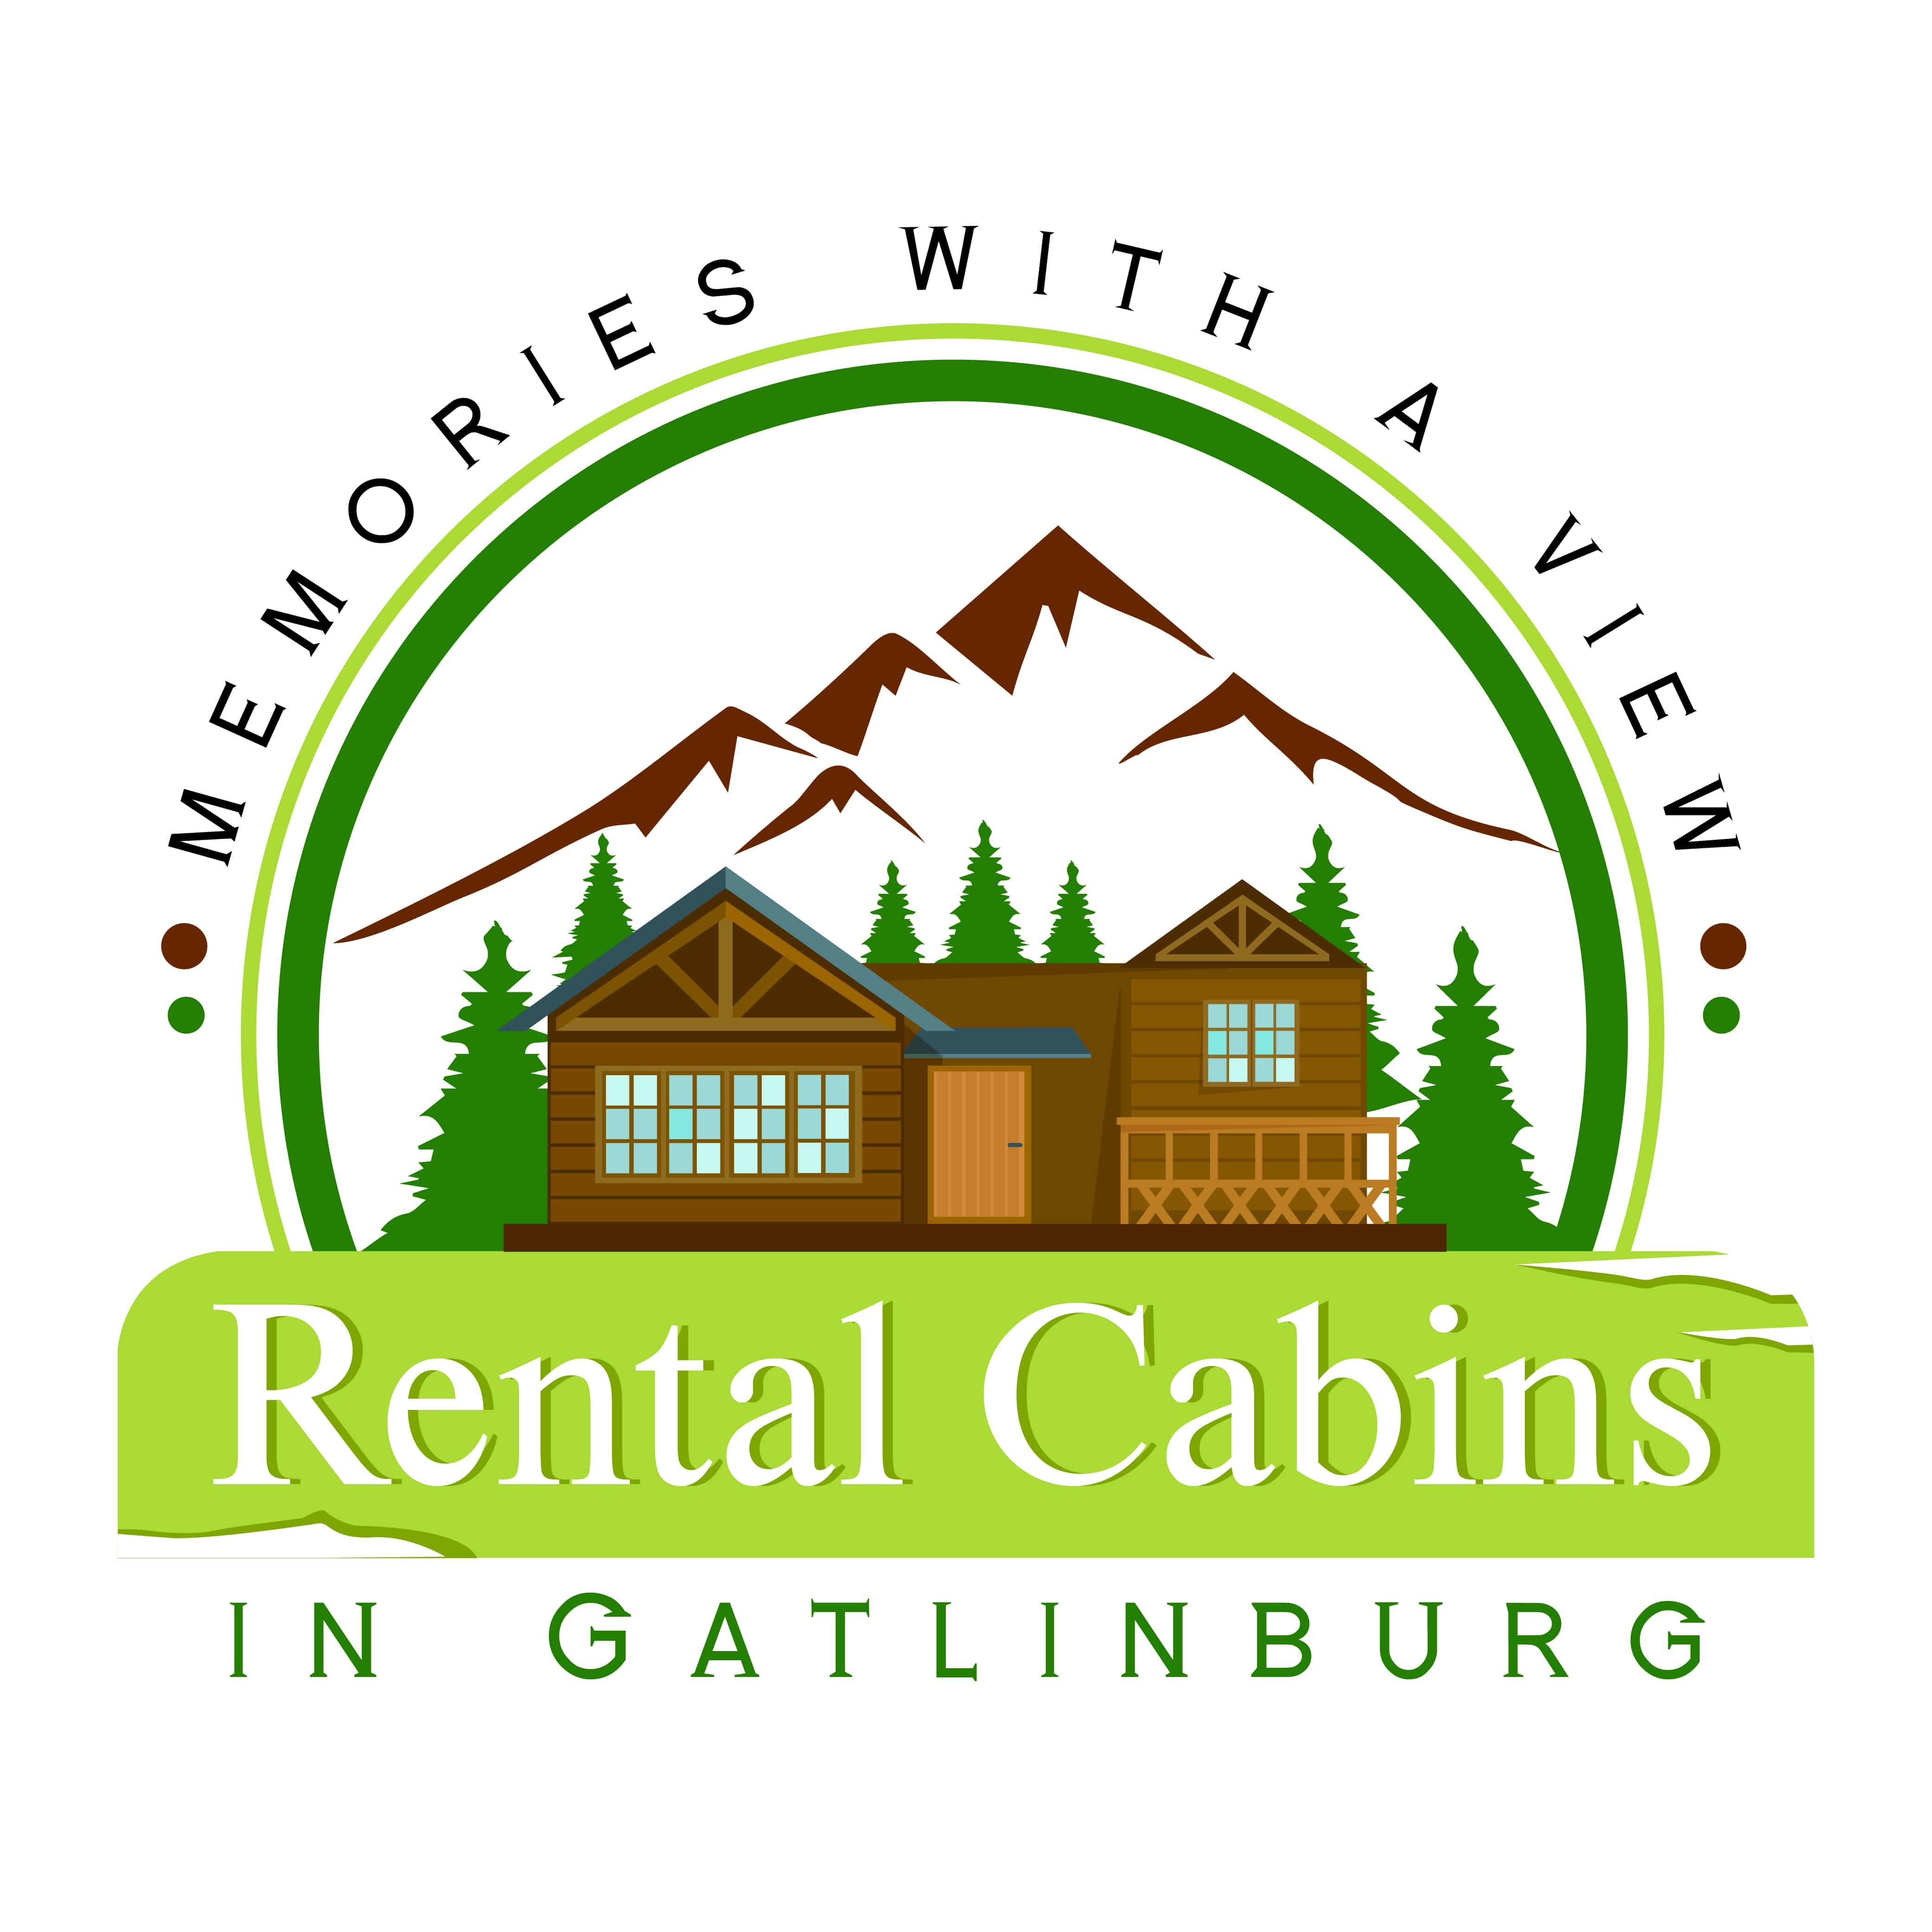 RentalCabinsInGatlinburg.com